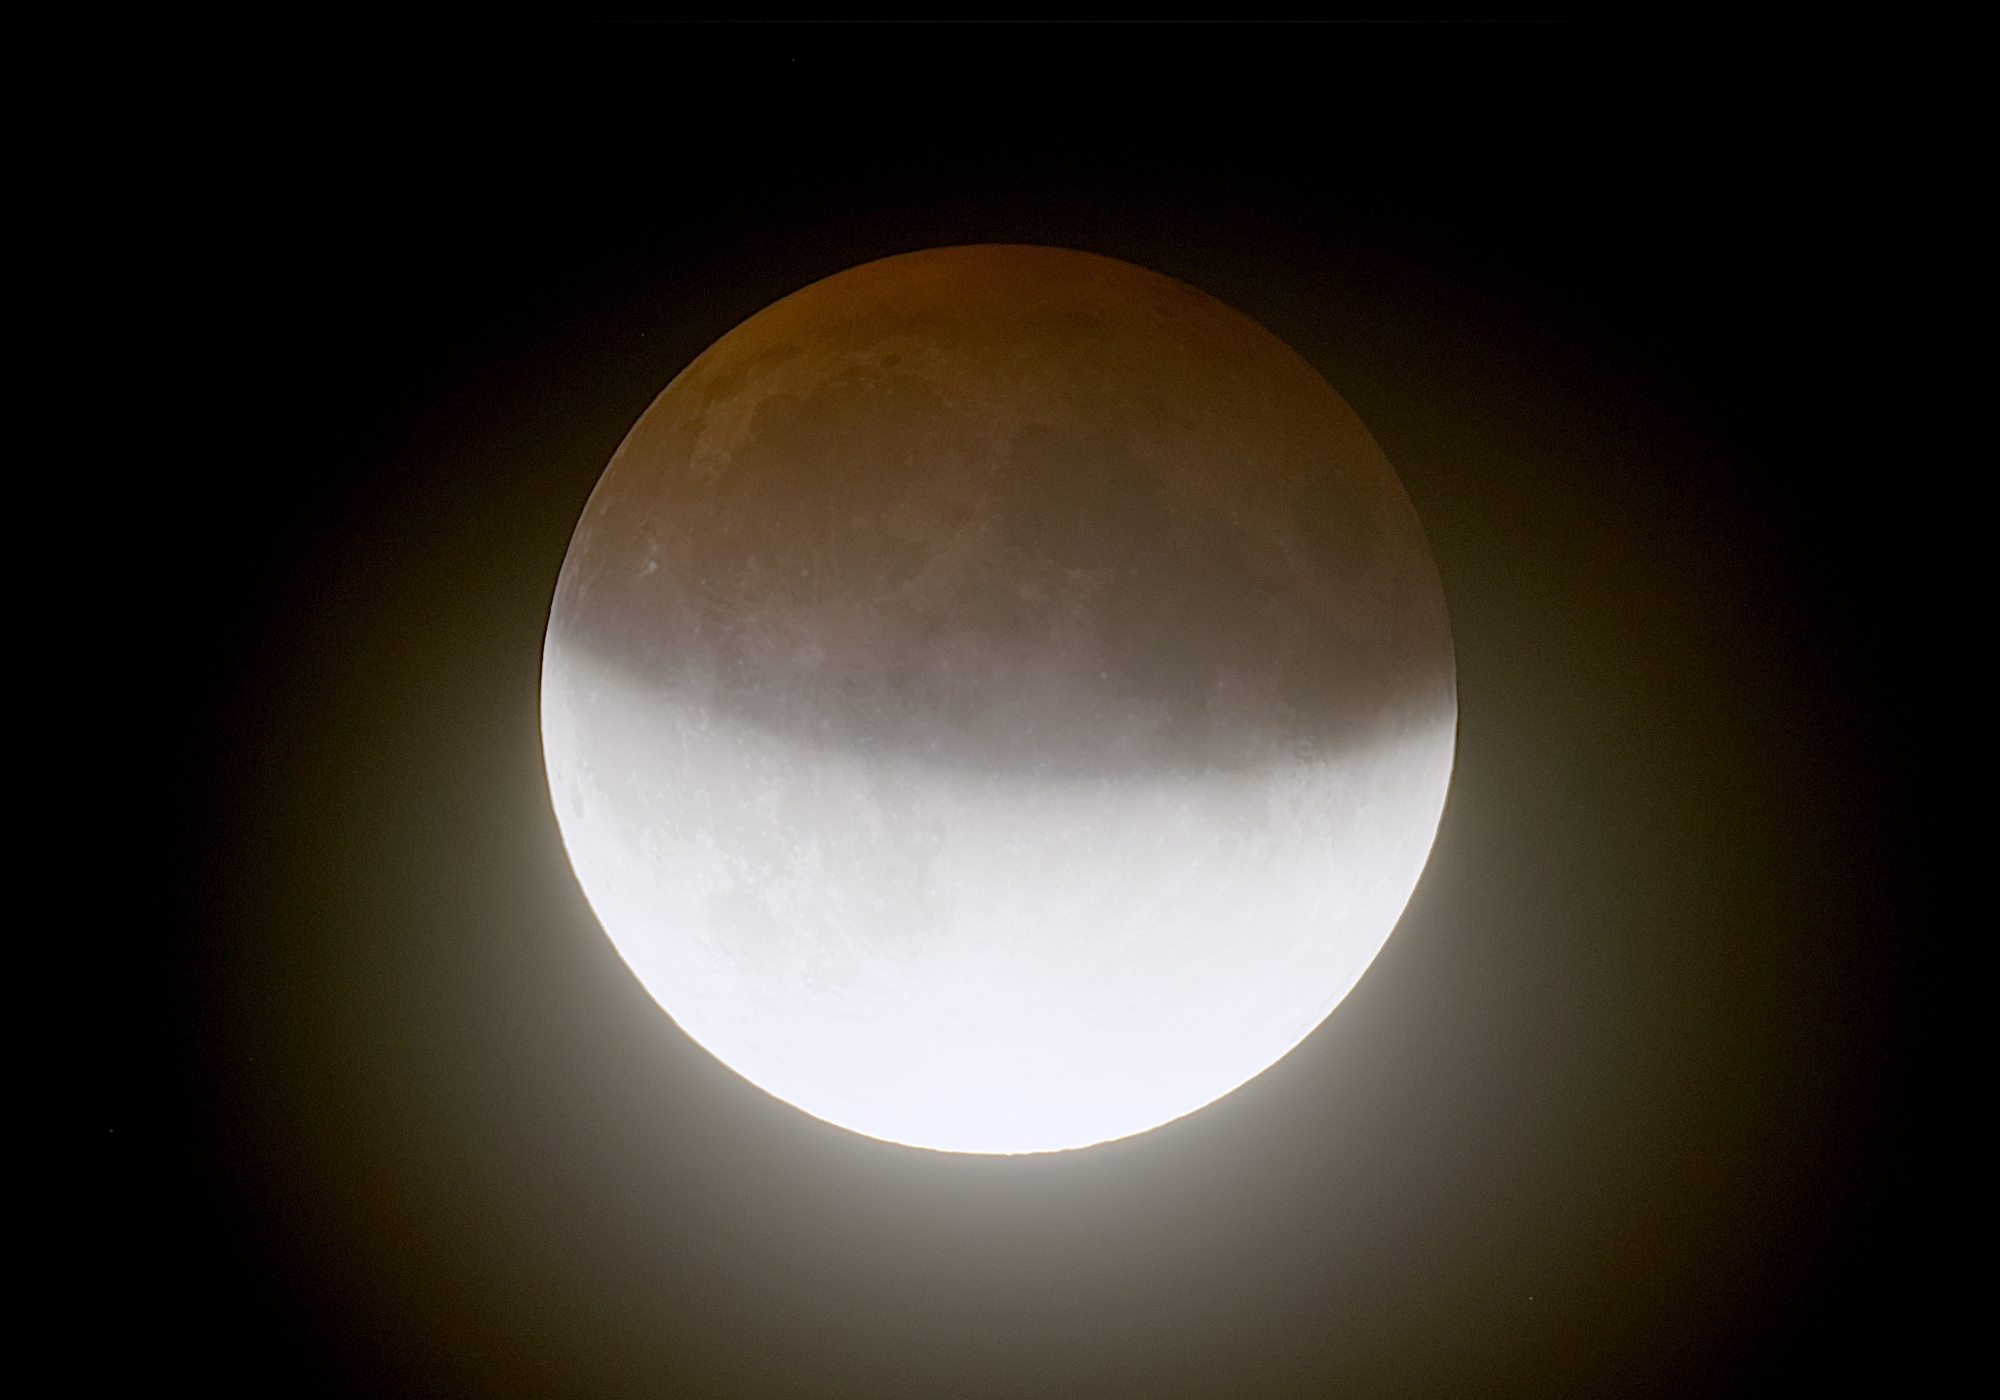 eclipselune-160719-21h58m49-t407f4bhdrlog.jpg.31f23e9e98dc8182a7717061d3598139.jpg